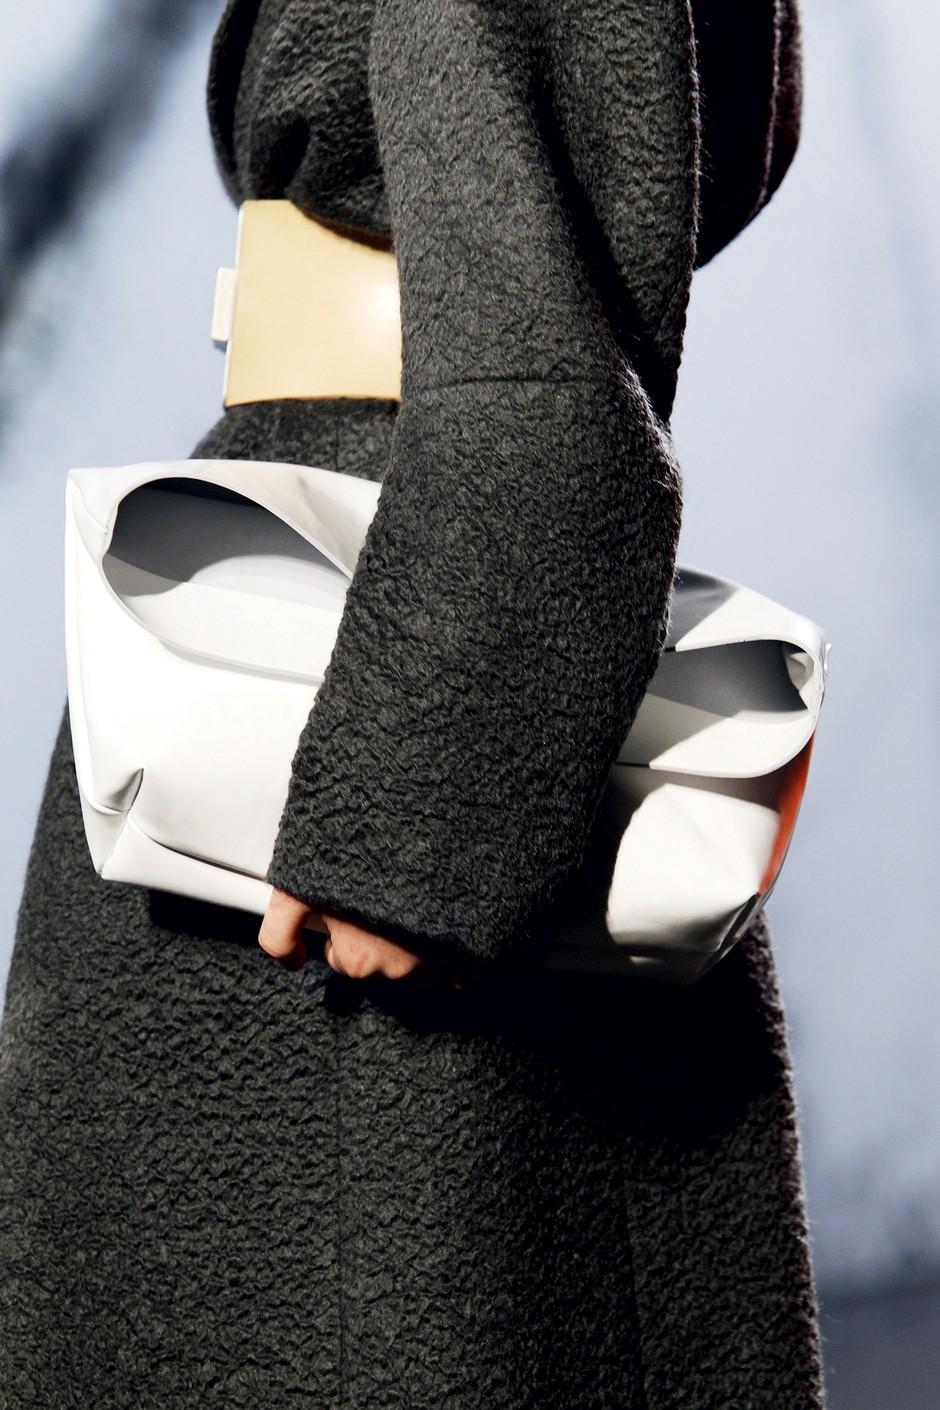 Acne (foto: Alex Štokelj, All-About-Fashion, promocijsko gradivo)